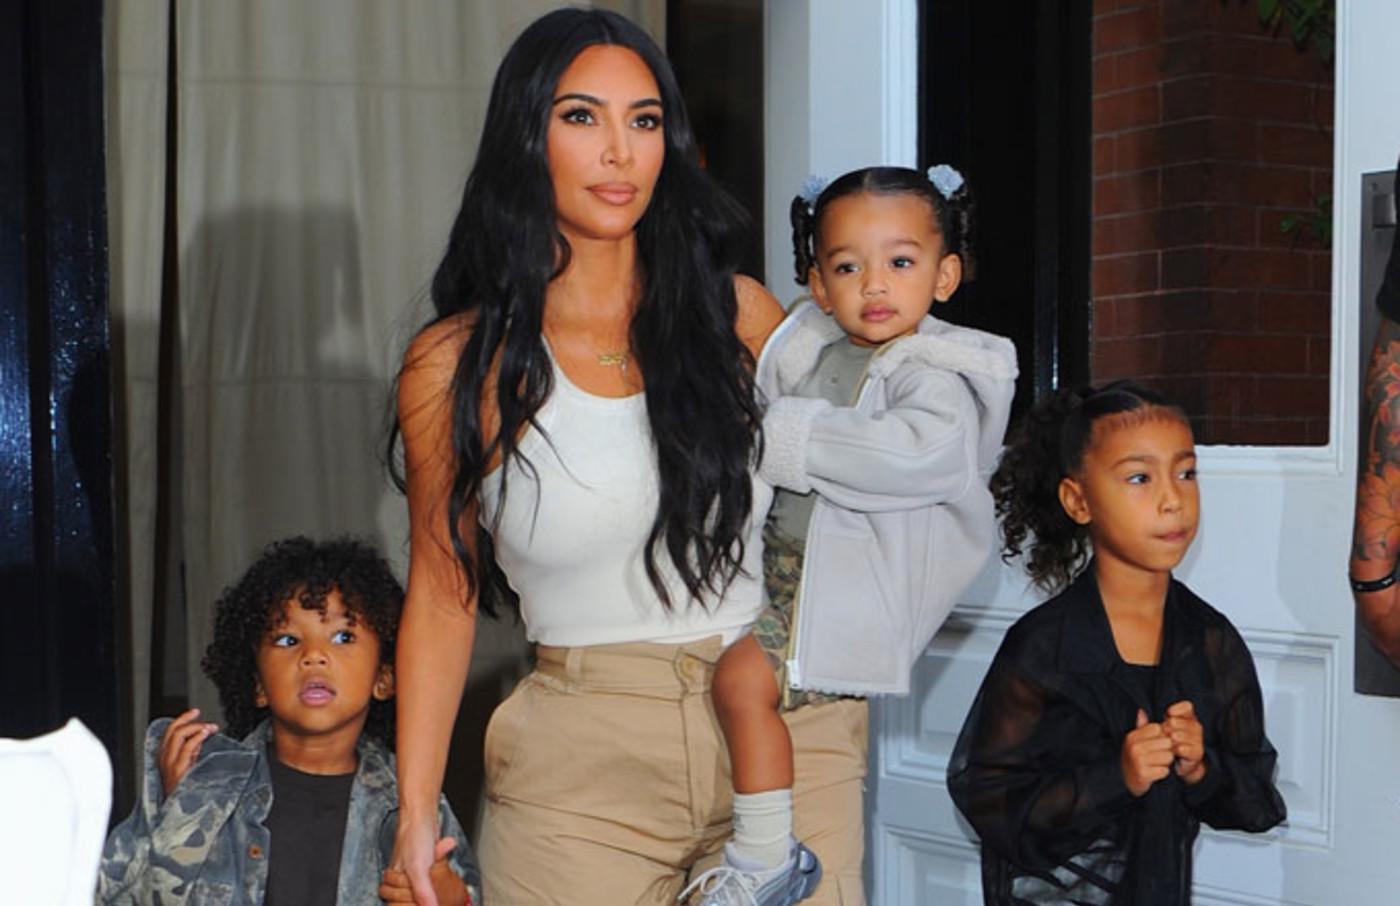 REALITY ZVIJEZDA POSLALA PORUKU I TURSKOJ! Kim Kardashian pozvala Azerbejdžan da prekine upotrebu sile nad Armenima